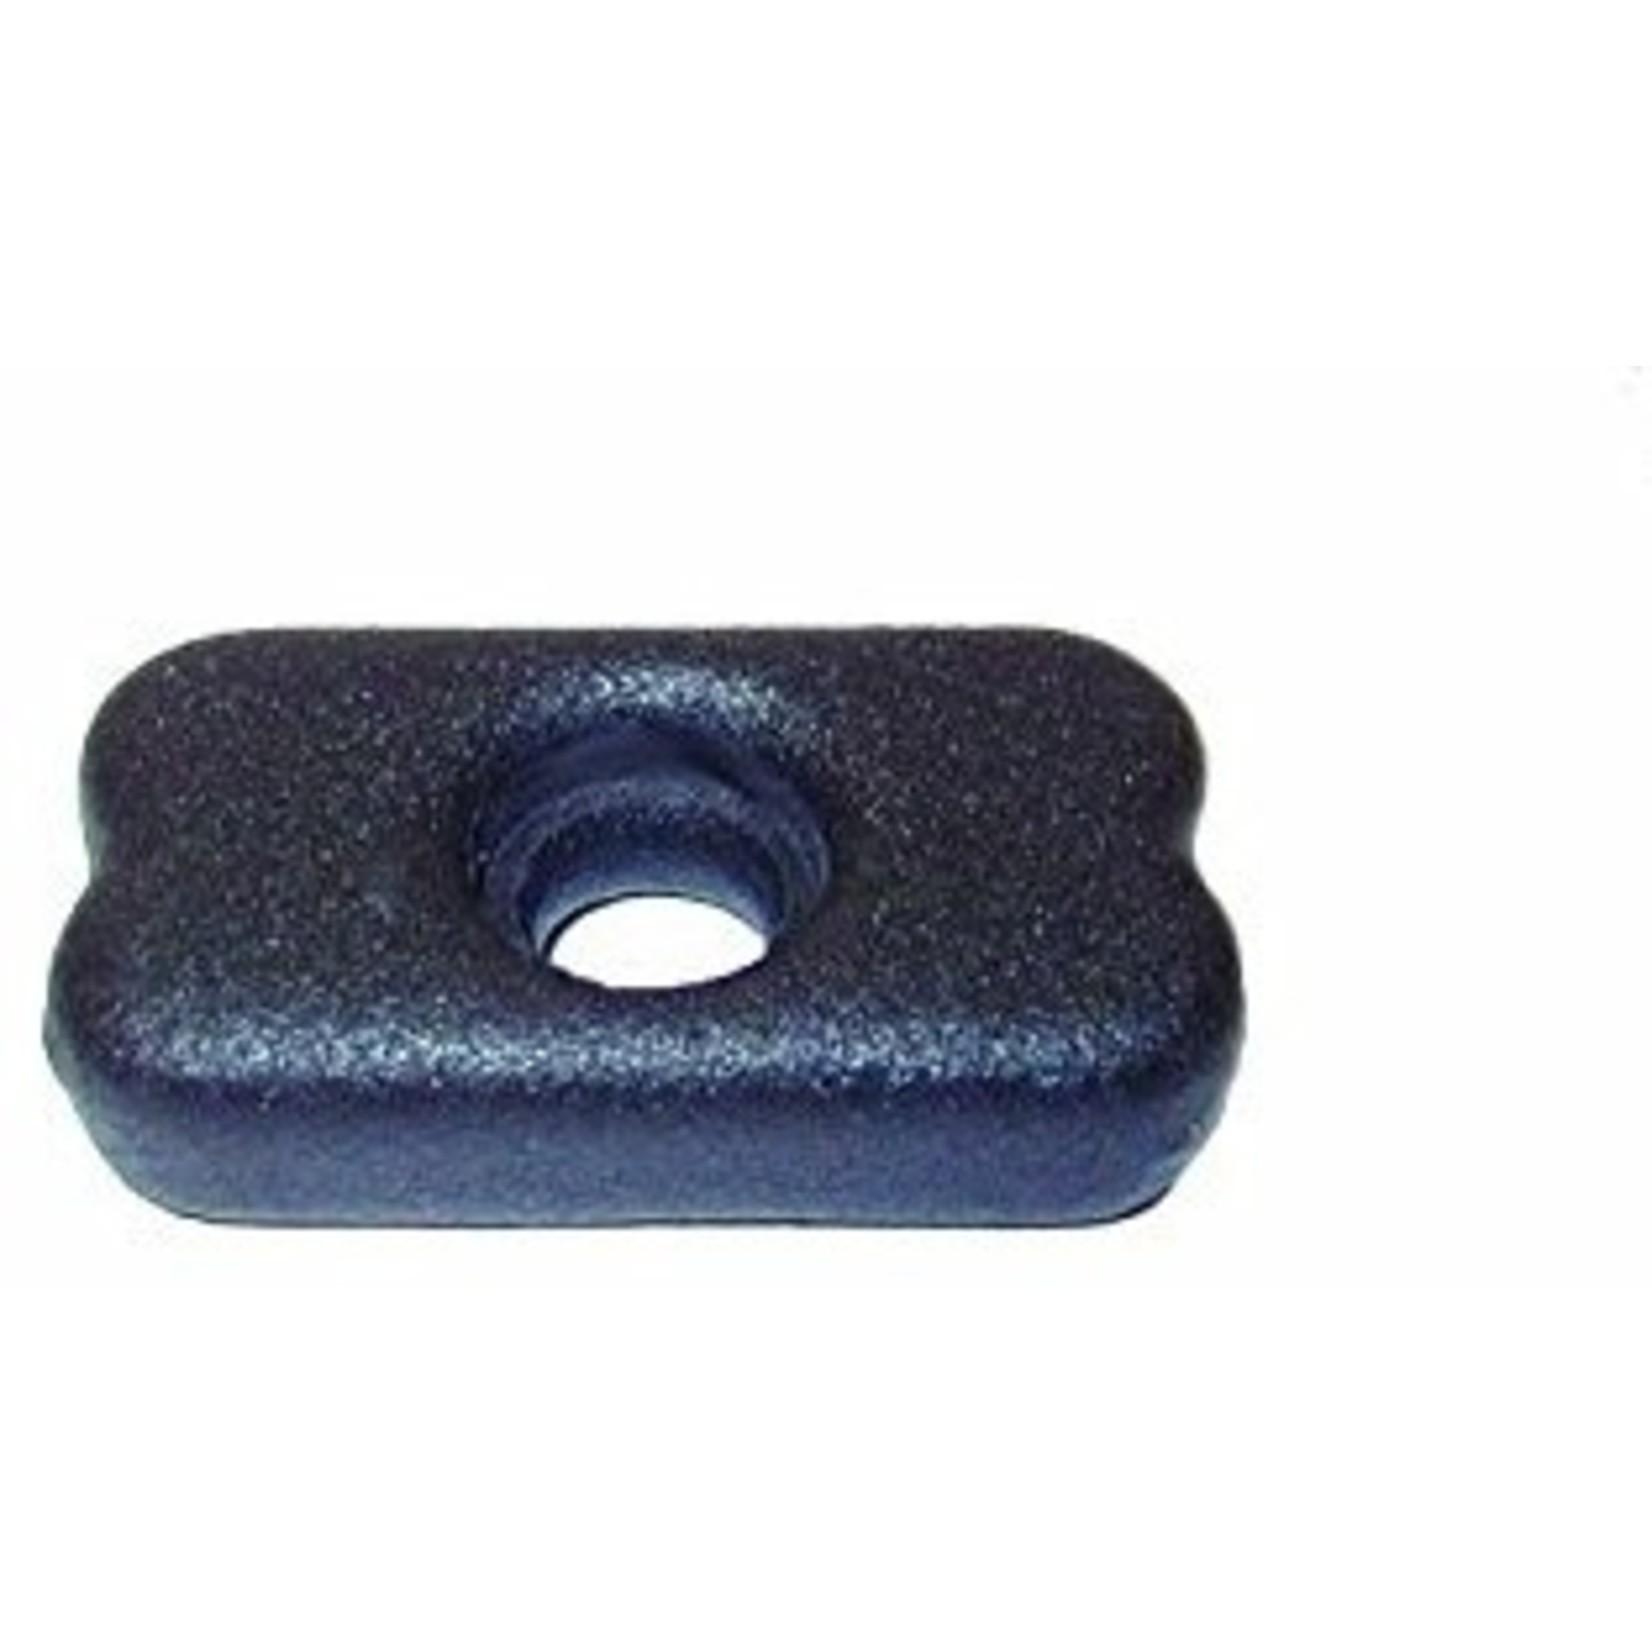 Sealife Buoyancy control weight (+ 3 mounting screw)